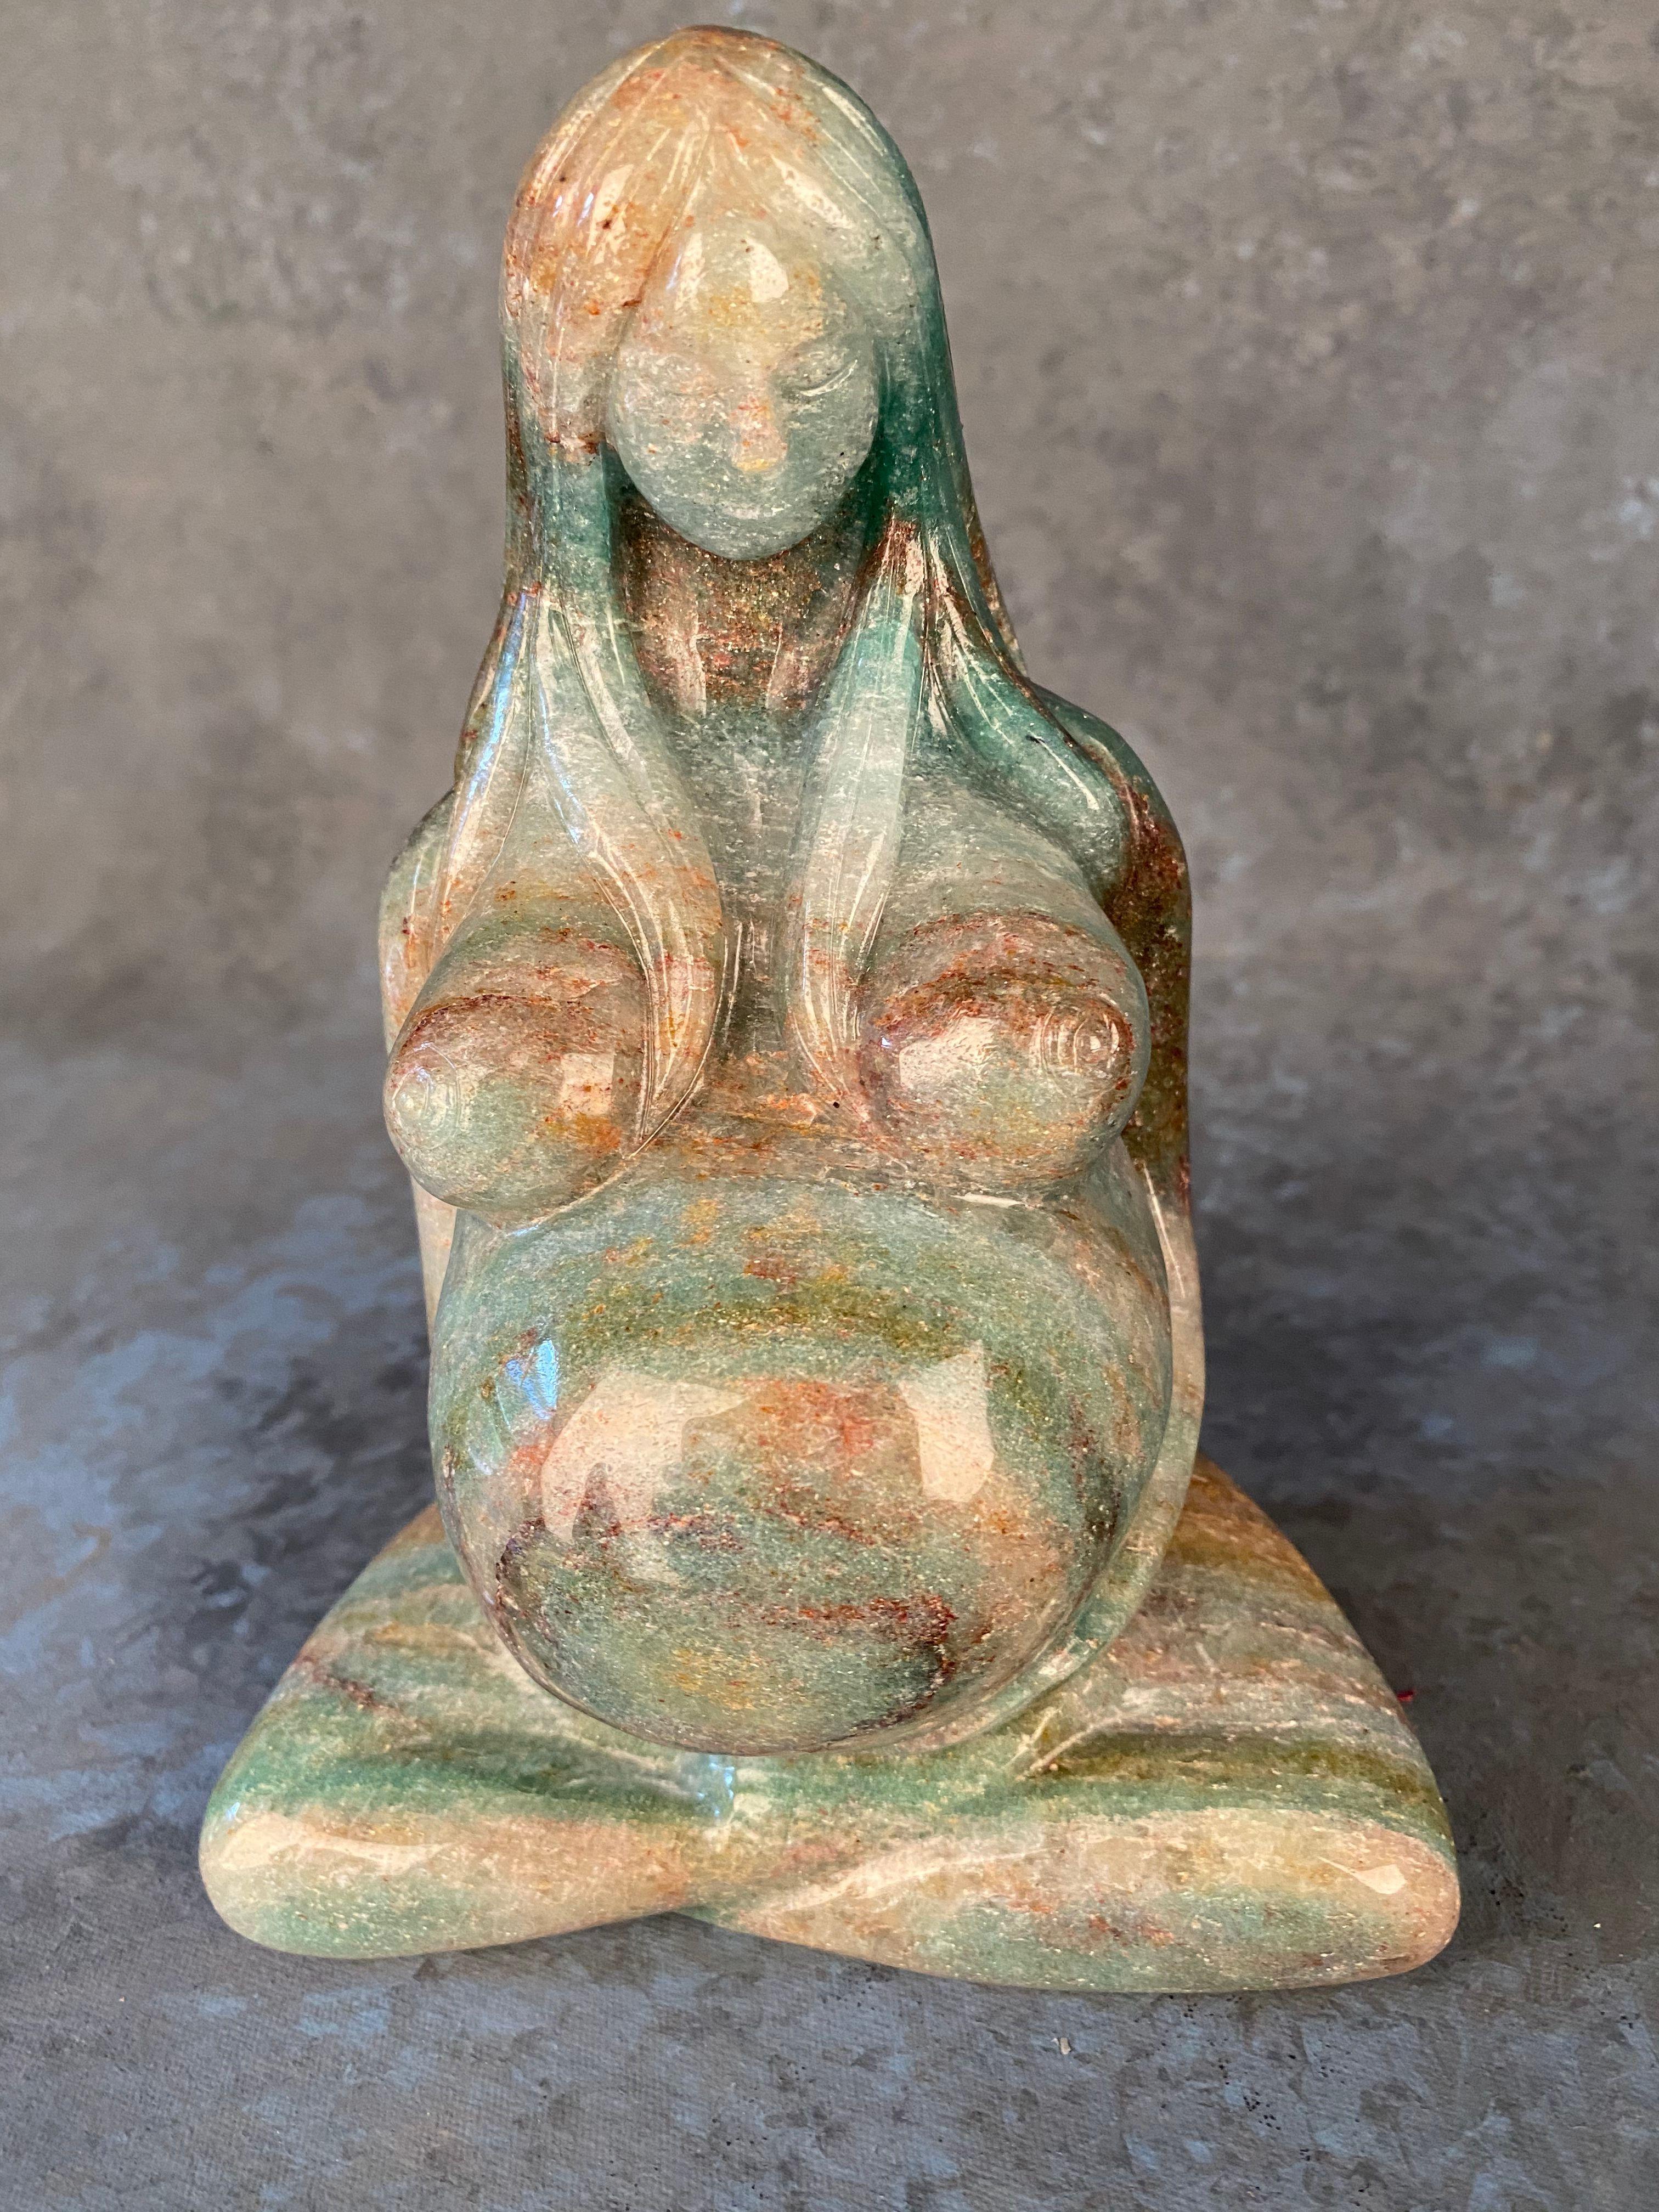 Gaia Earth Mother Goddess - Fuchsinated Aventurine